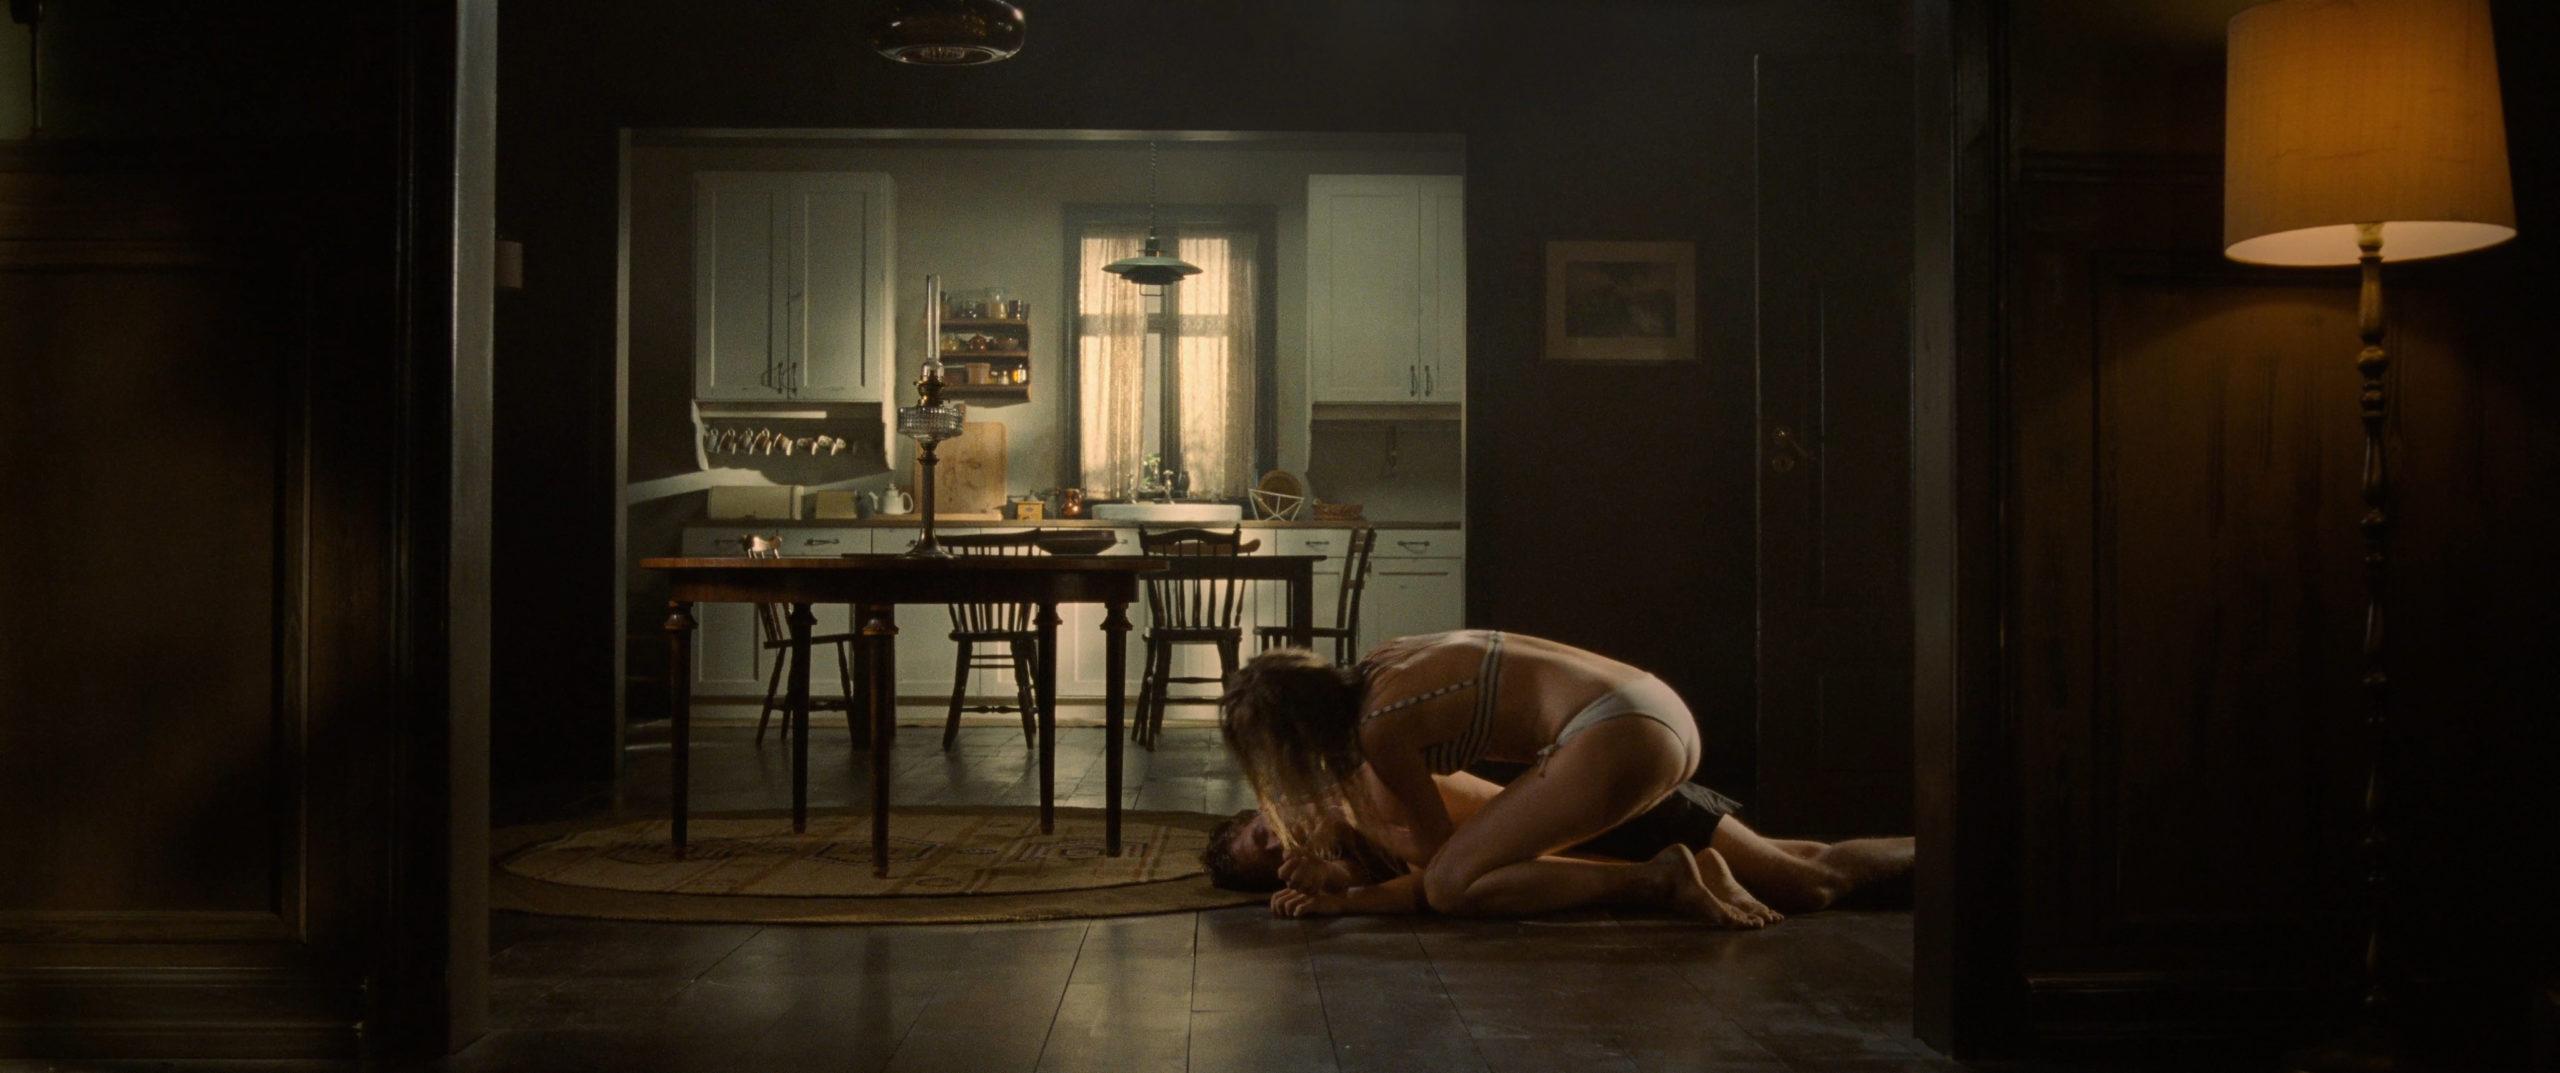 Lake of Death immagine dal trailer